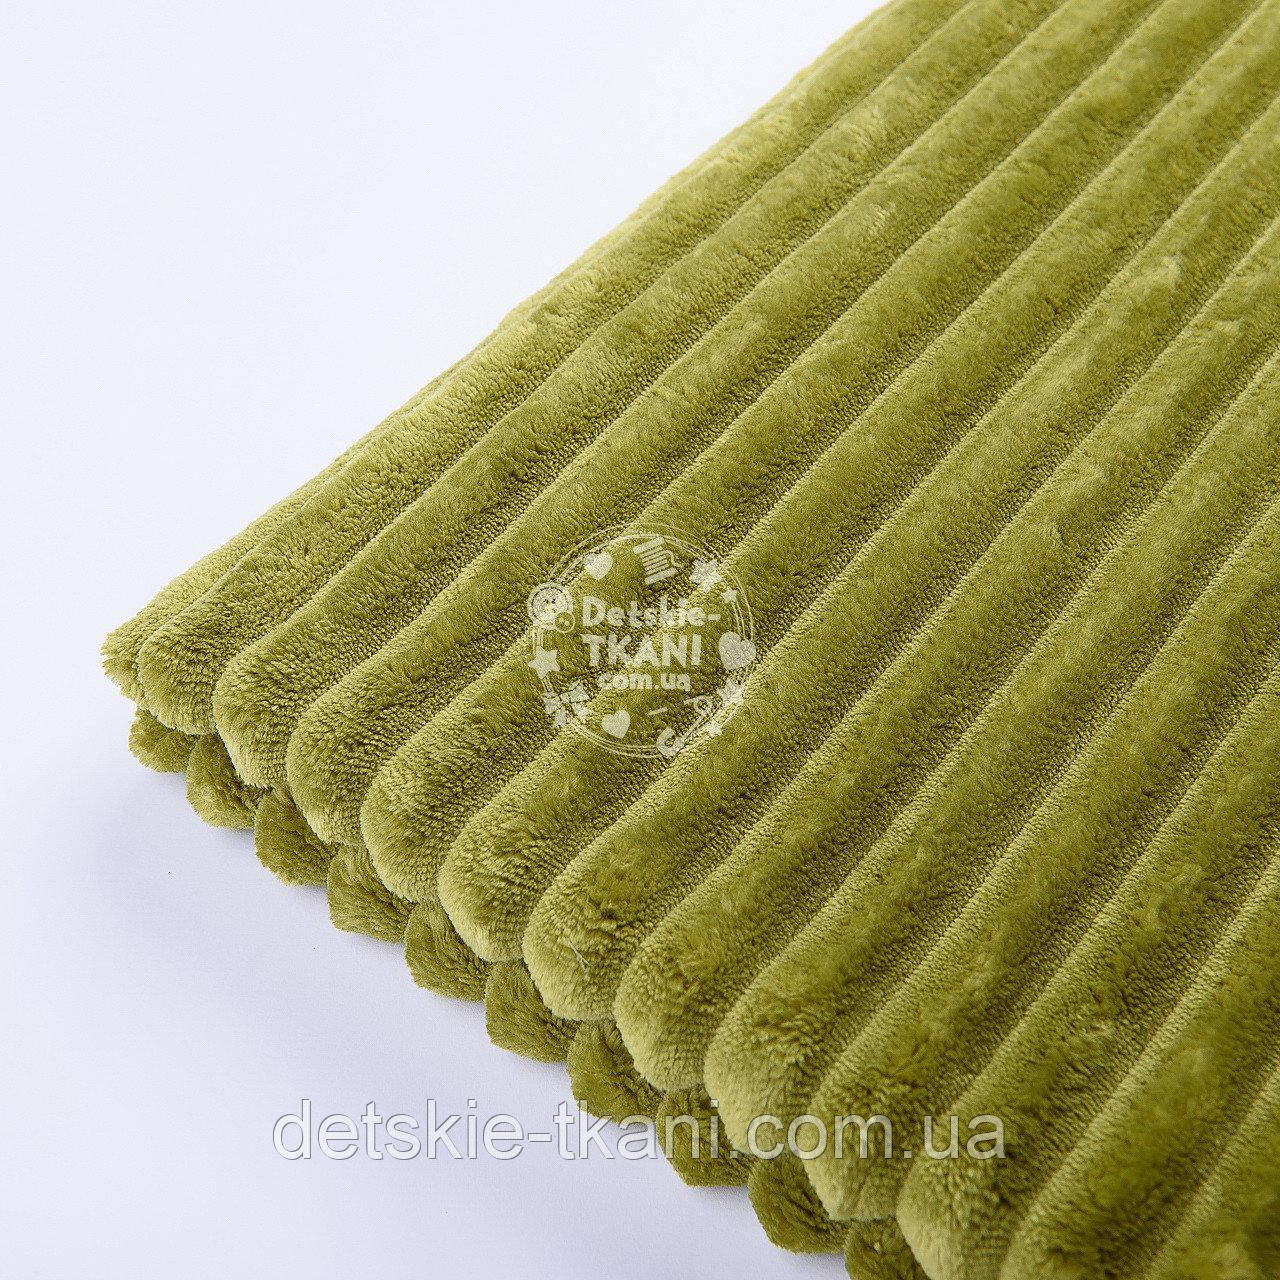 Лоскут плюша в полоску Stripes тёмно-оливкового цвета 20*160 см